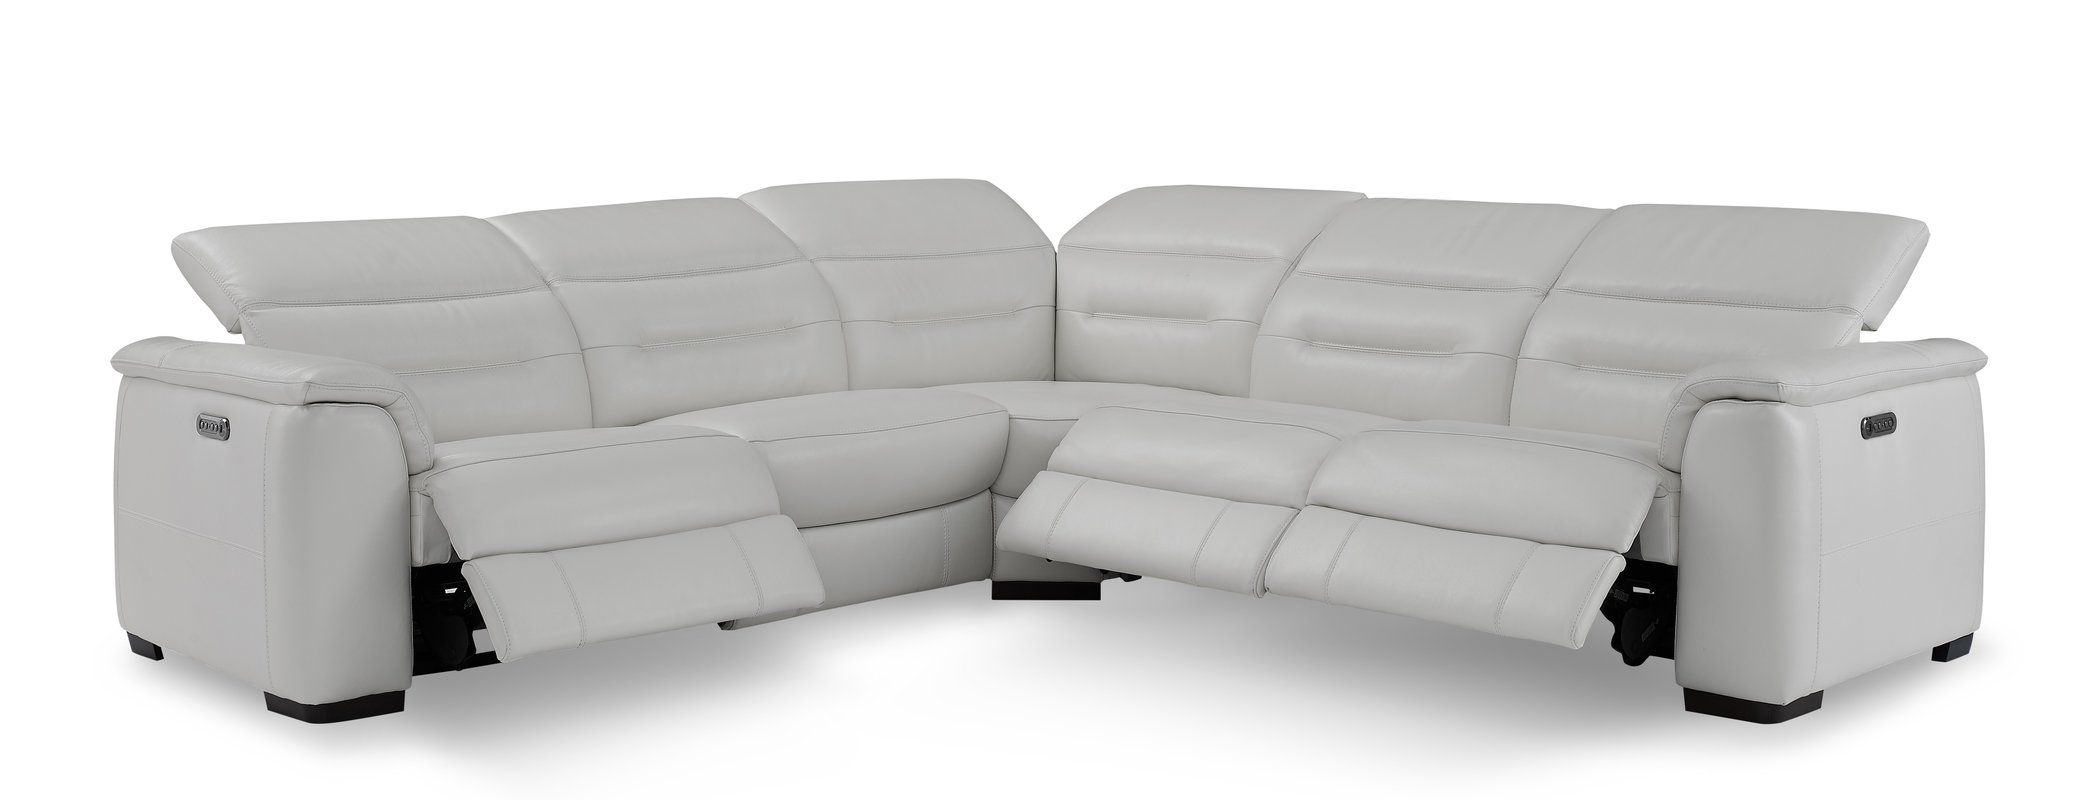 Isham Symmetrical Leather Symmetrical Reclining Sectional Reclining Sectional Leather Reclining Sectional Sectional